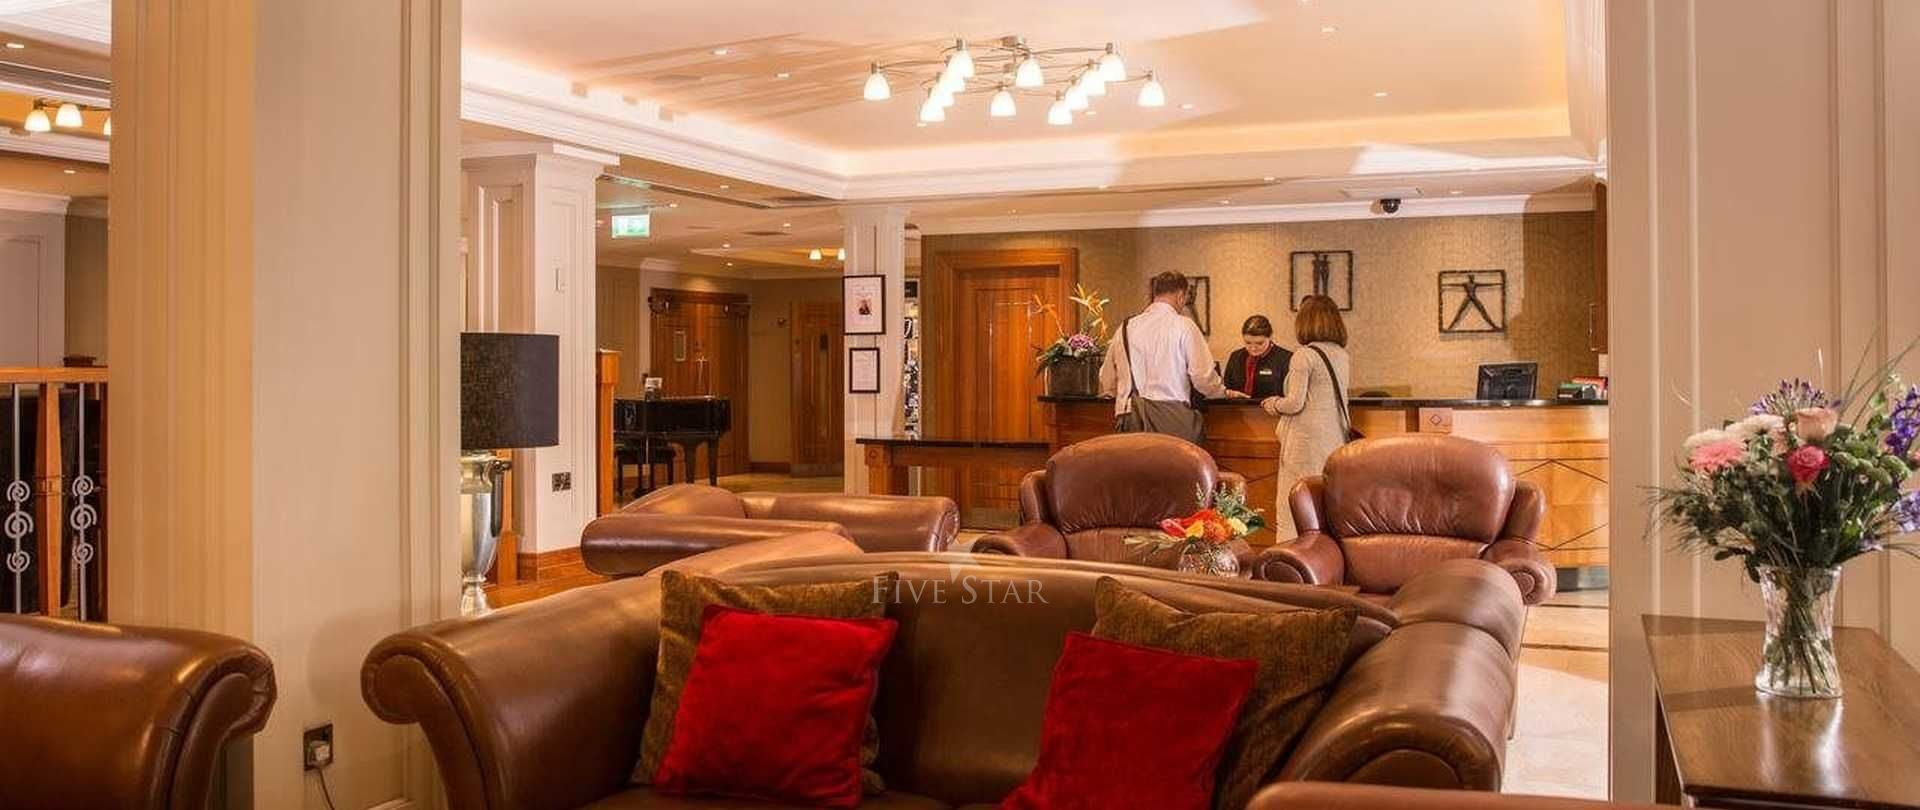 Malone Lodge Hotel & Apartments photo 4